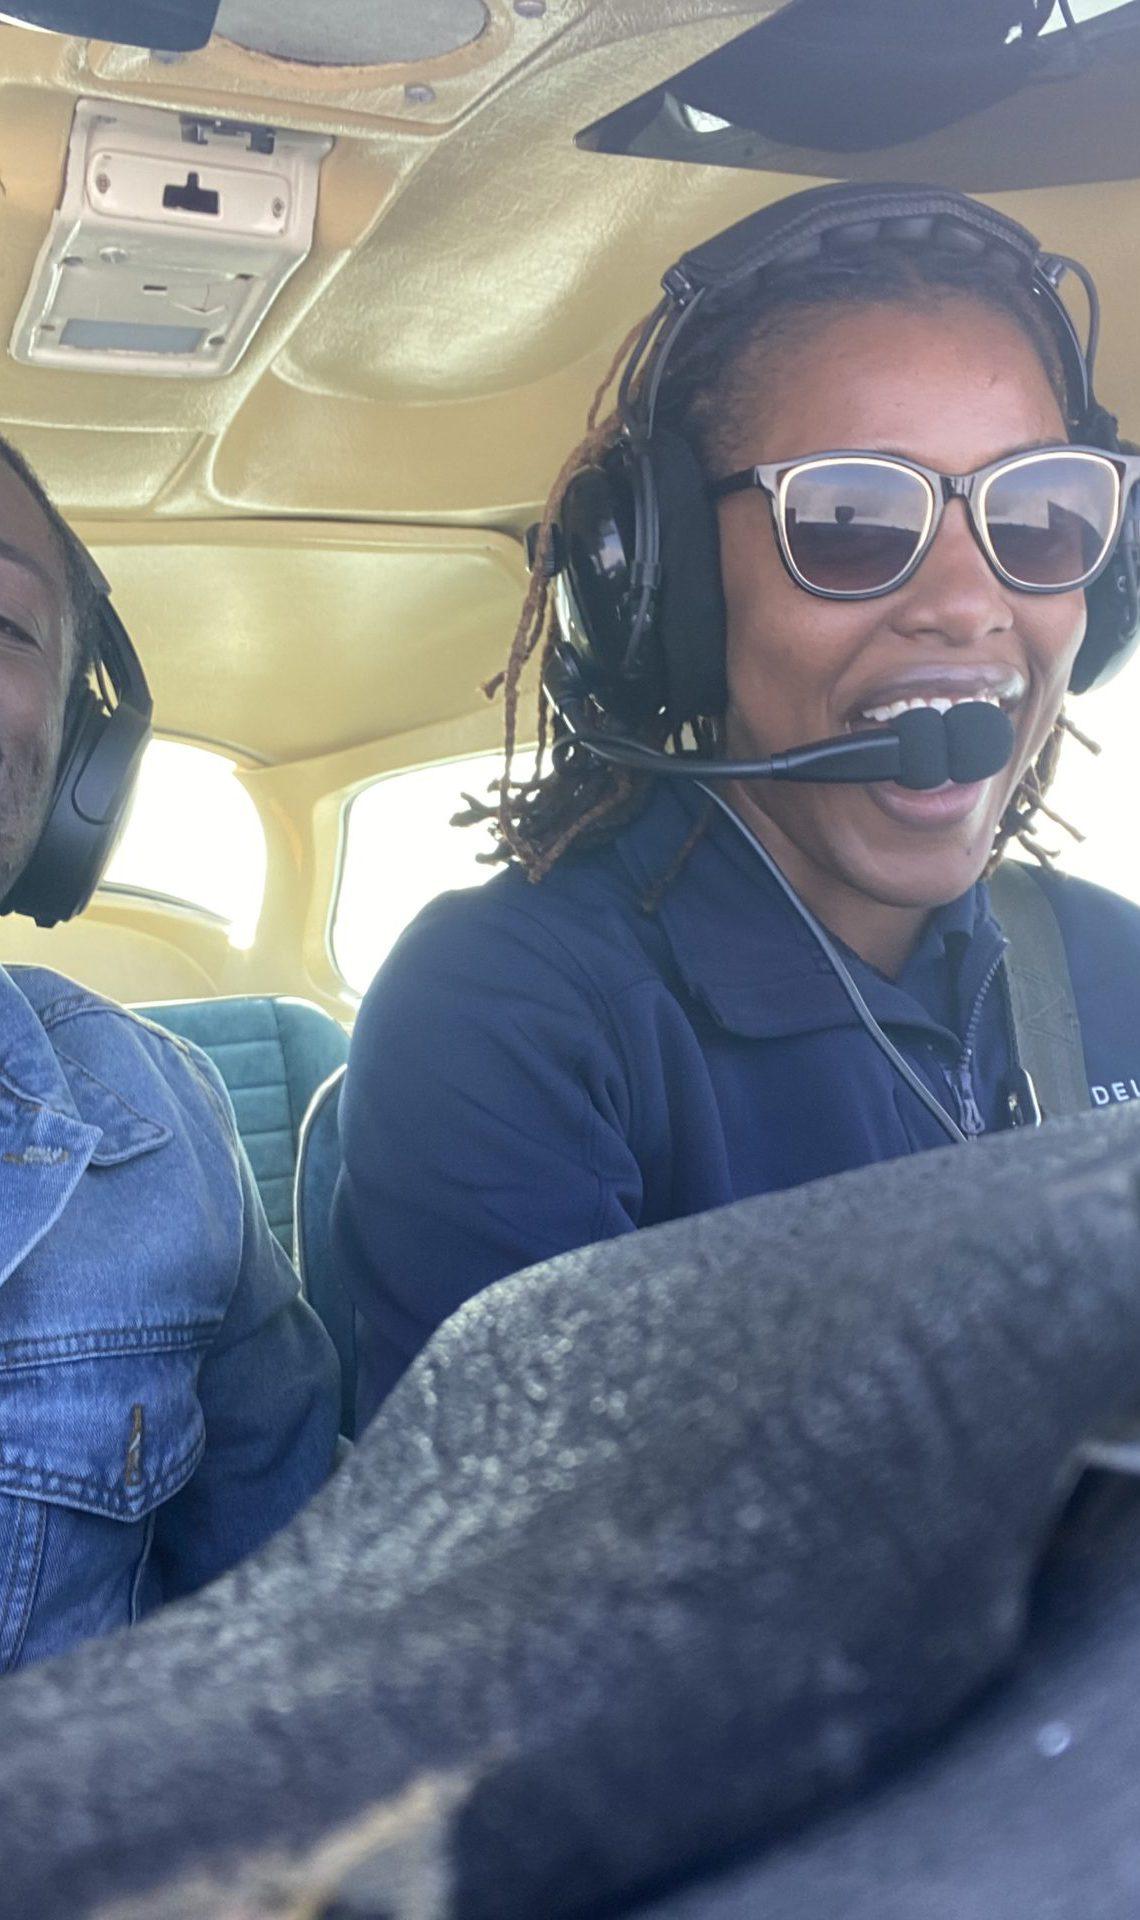 Flight attendant to pilot